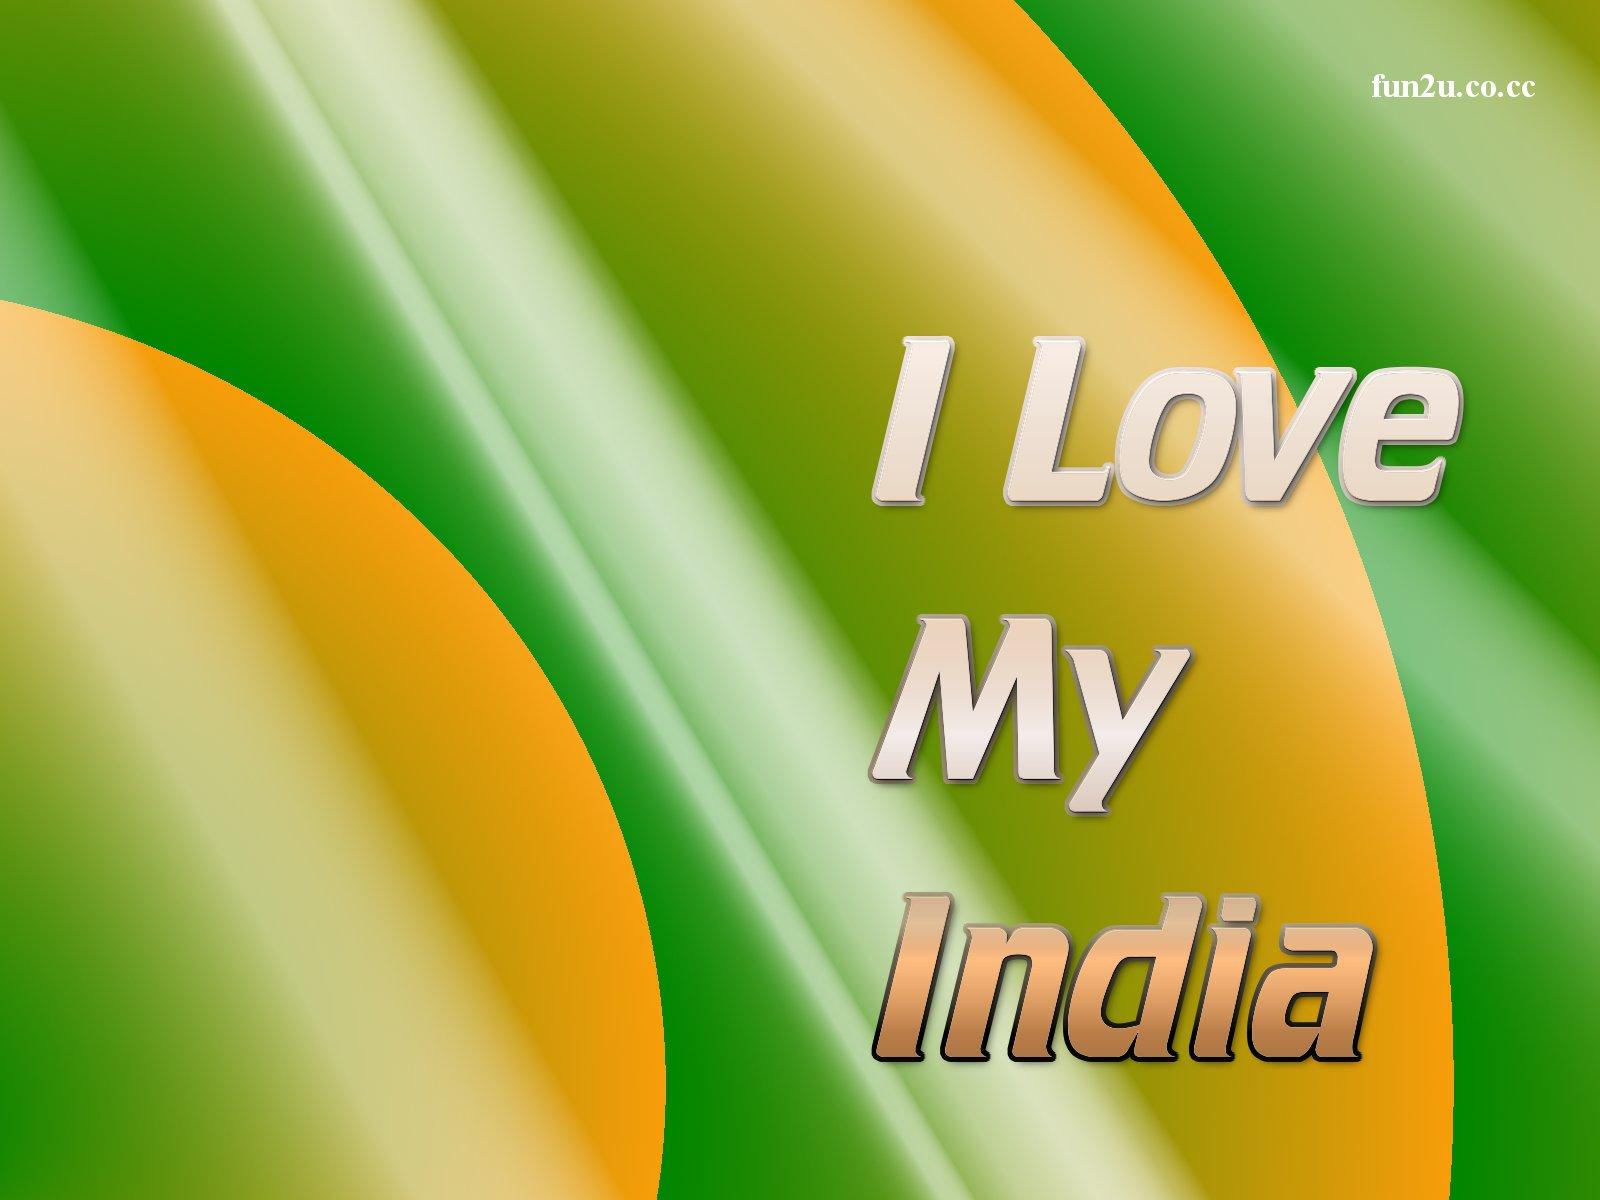 SmsQs: Desktop Wallpaper-I Love My India